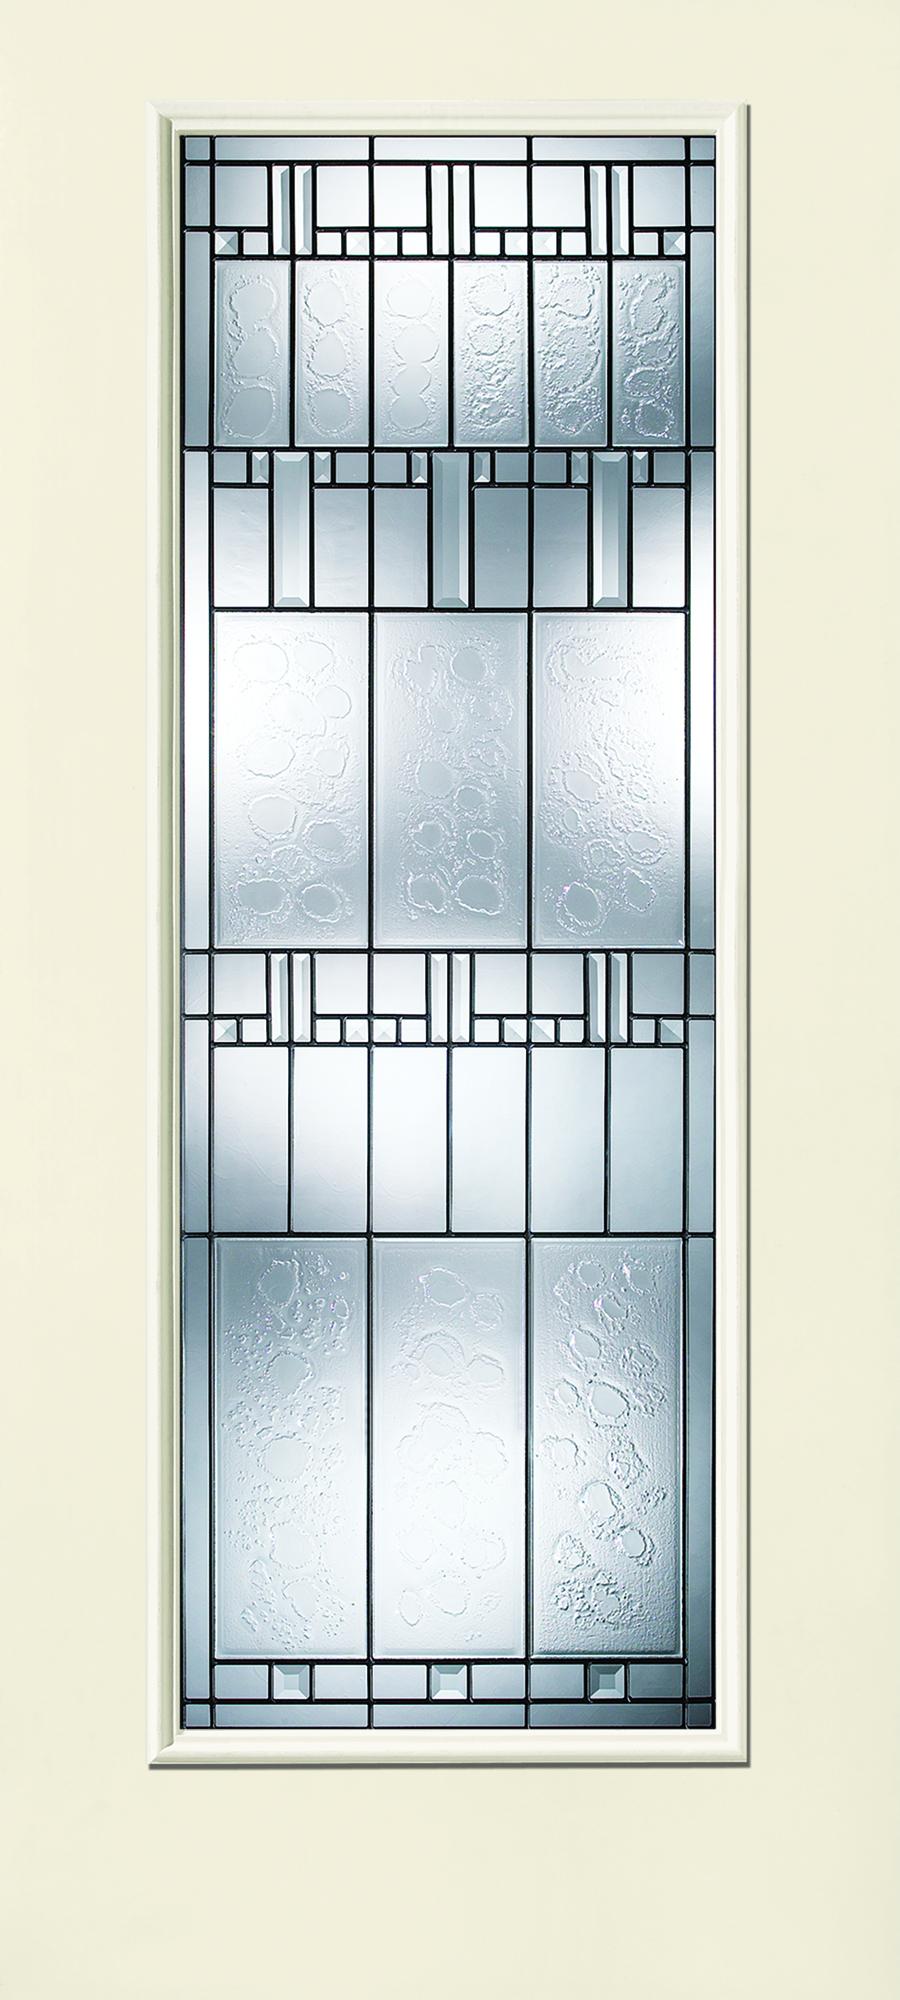 Therma tru sedona 22 x 80 glass and frame for Therma tru fiber classic mahogany price